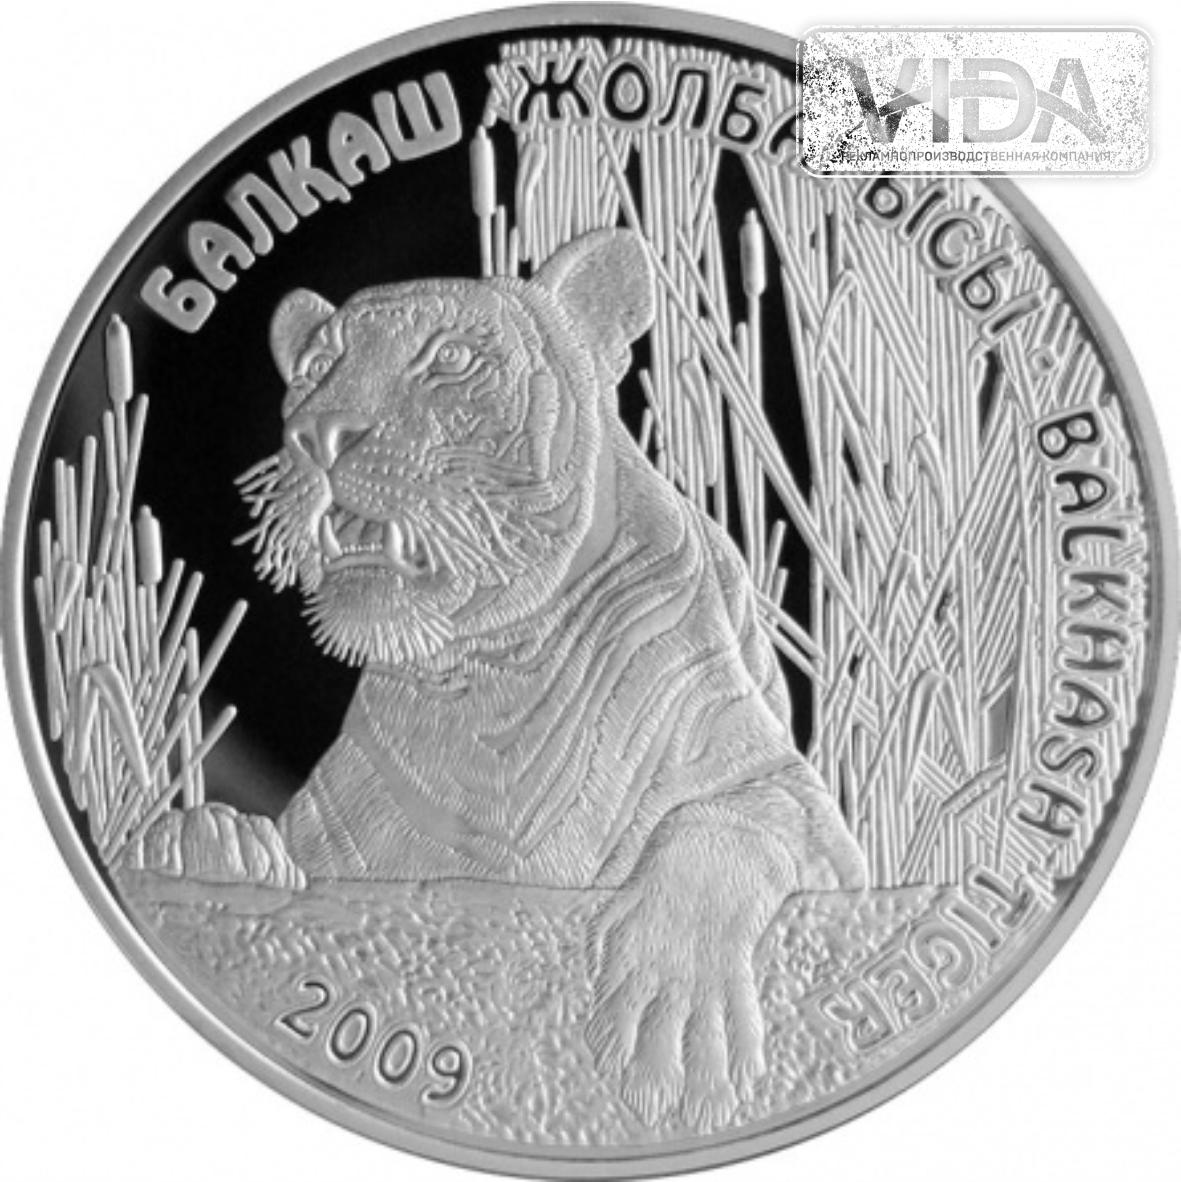 Балхашский тигр - 500 тенге (Серебро 925)